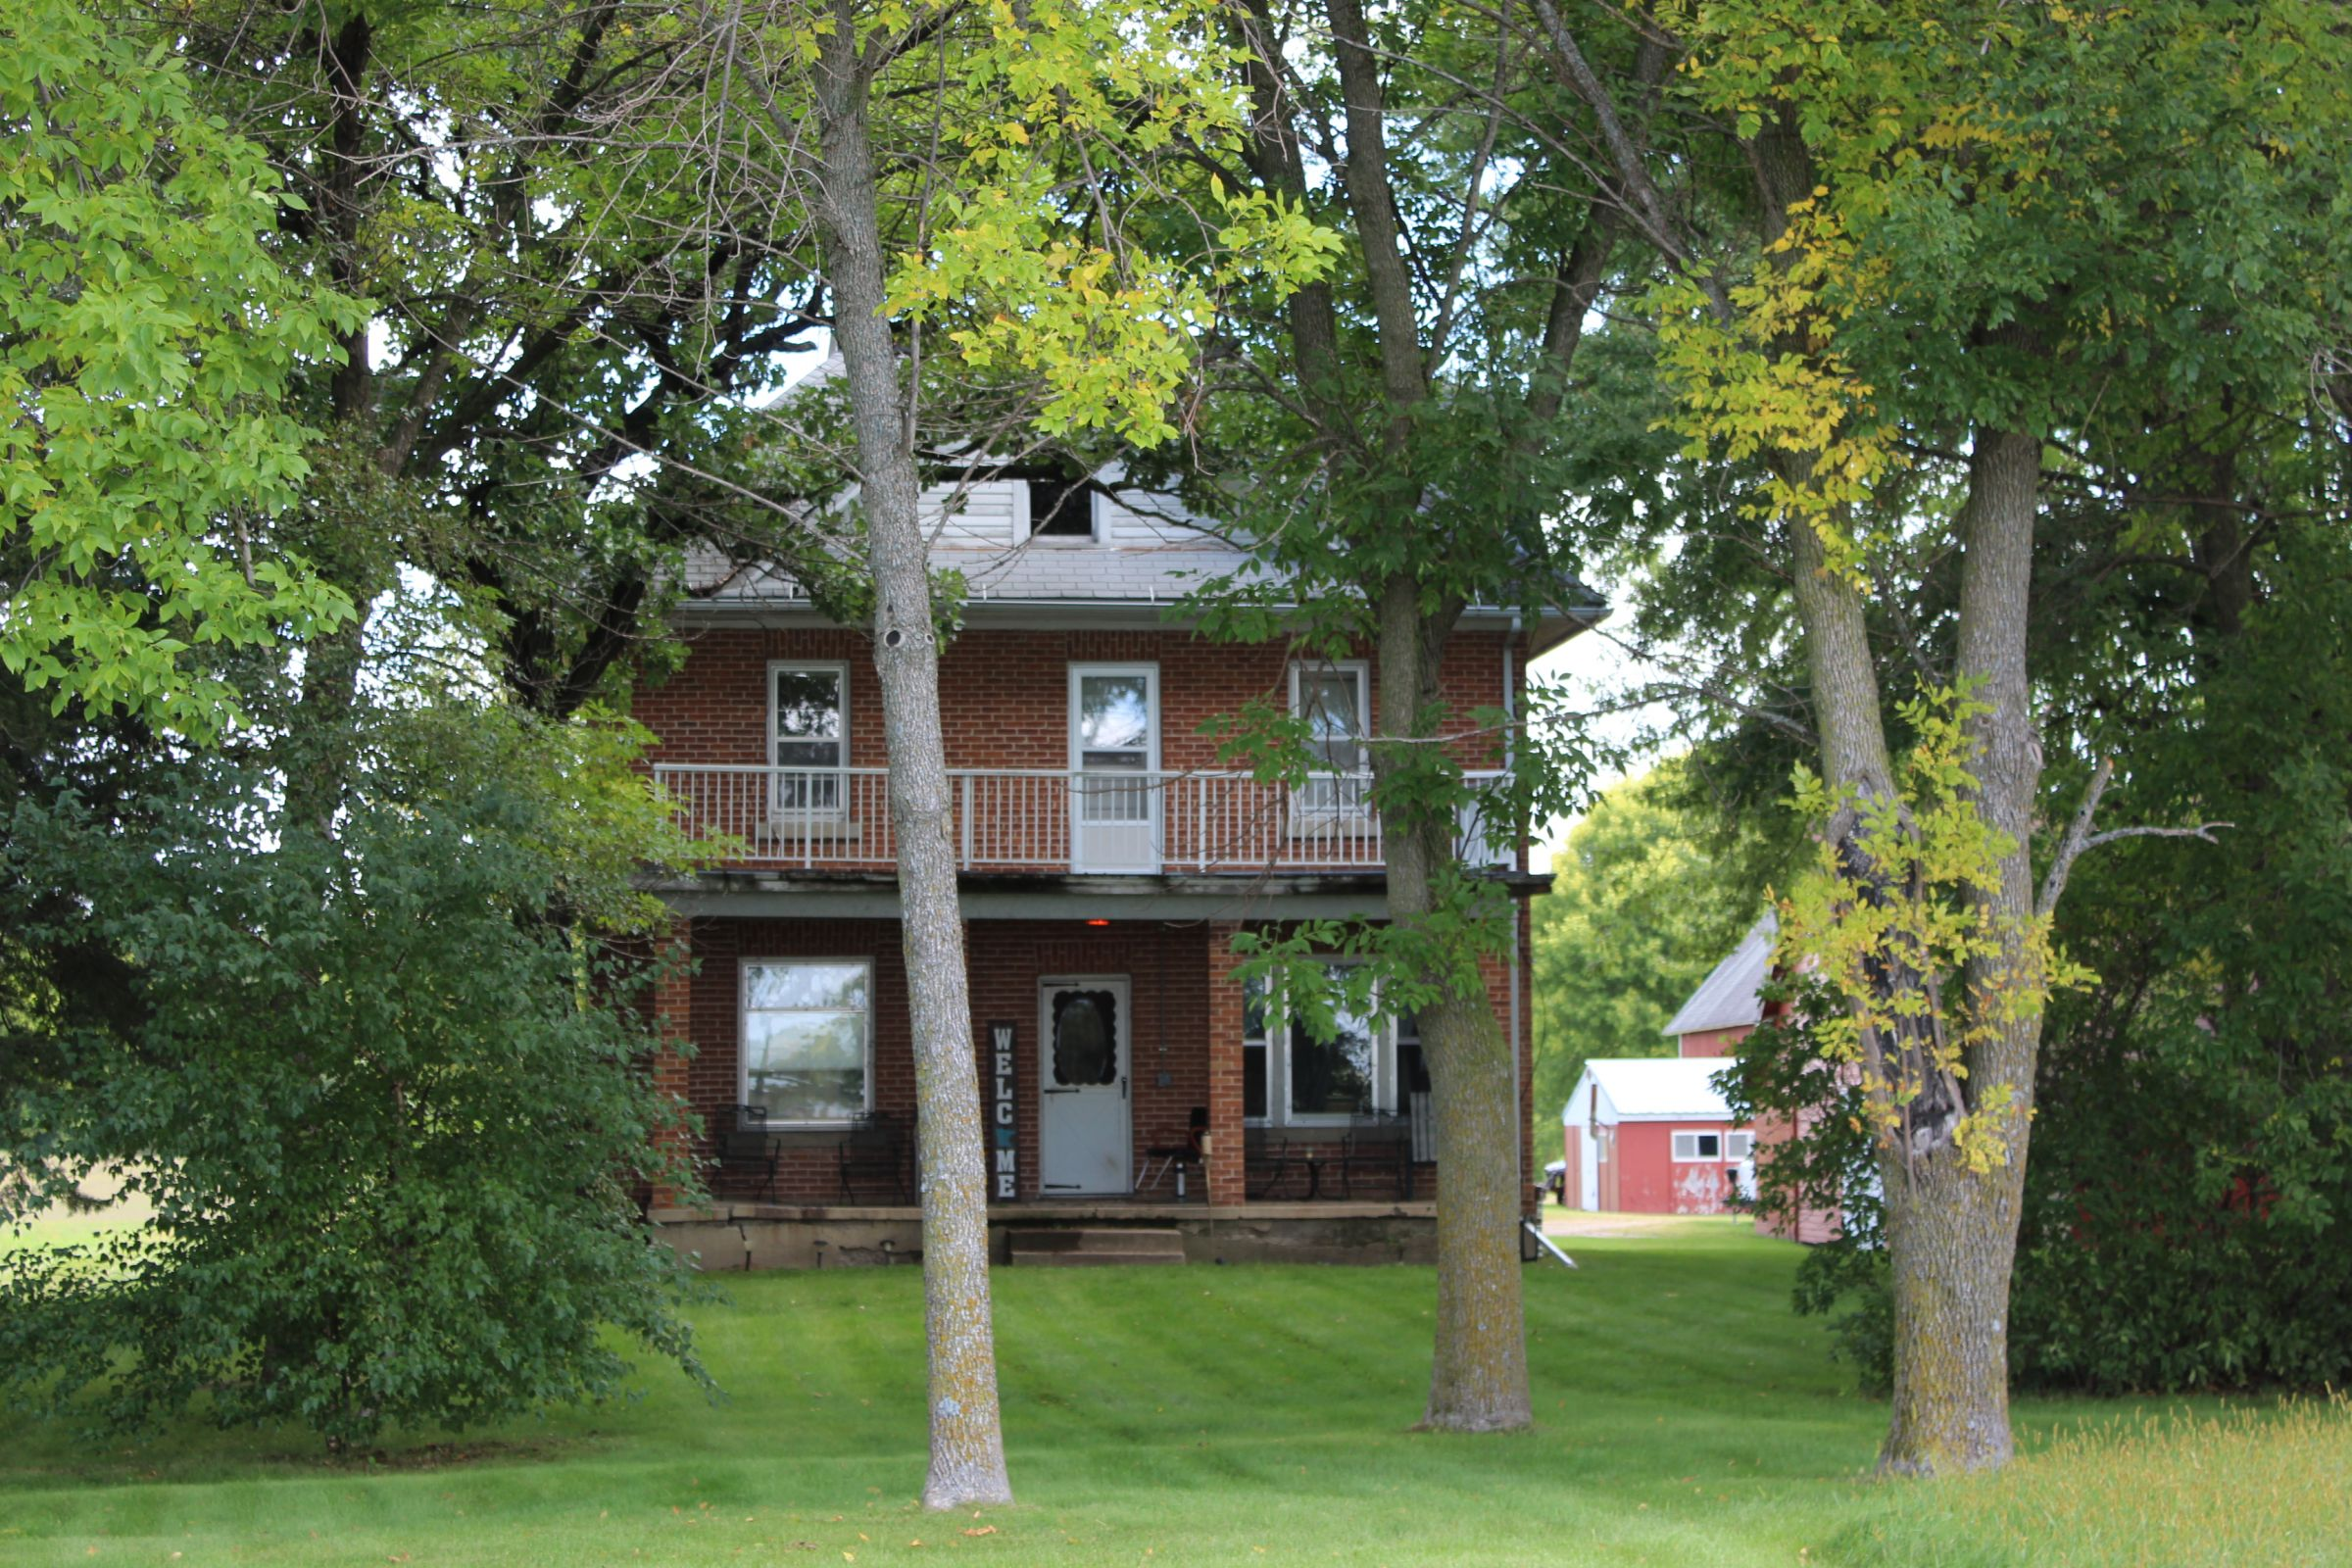 residential-land-mcleod-county-minnesota-80-acres-listing-number-15182-5-2020-09-23-163825.JPG